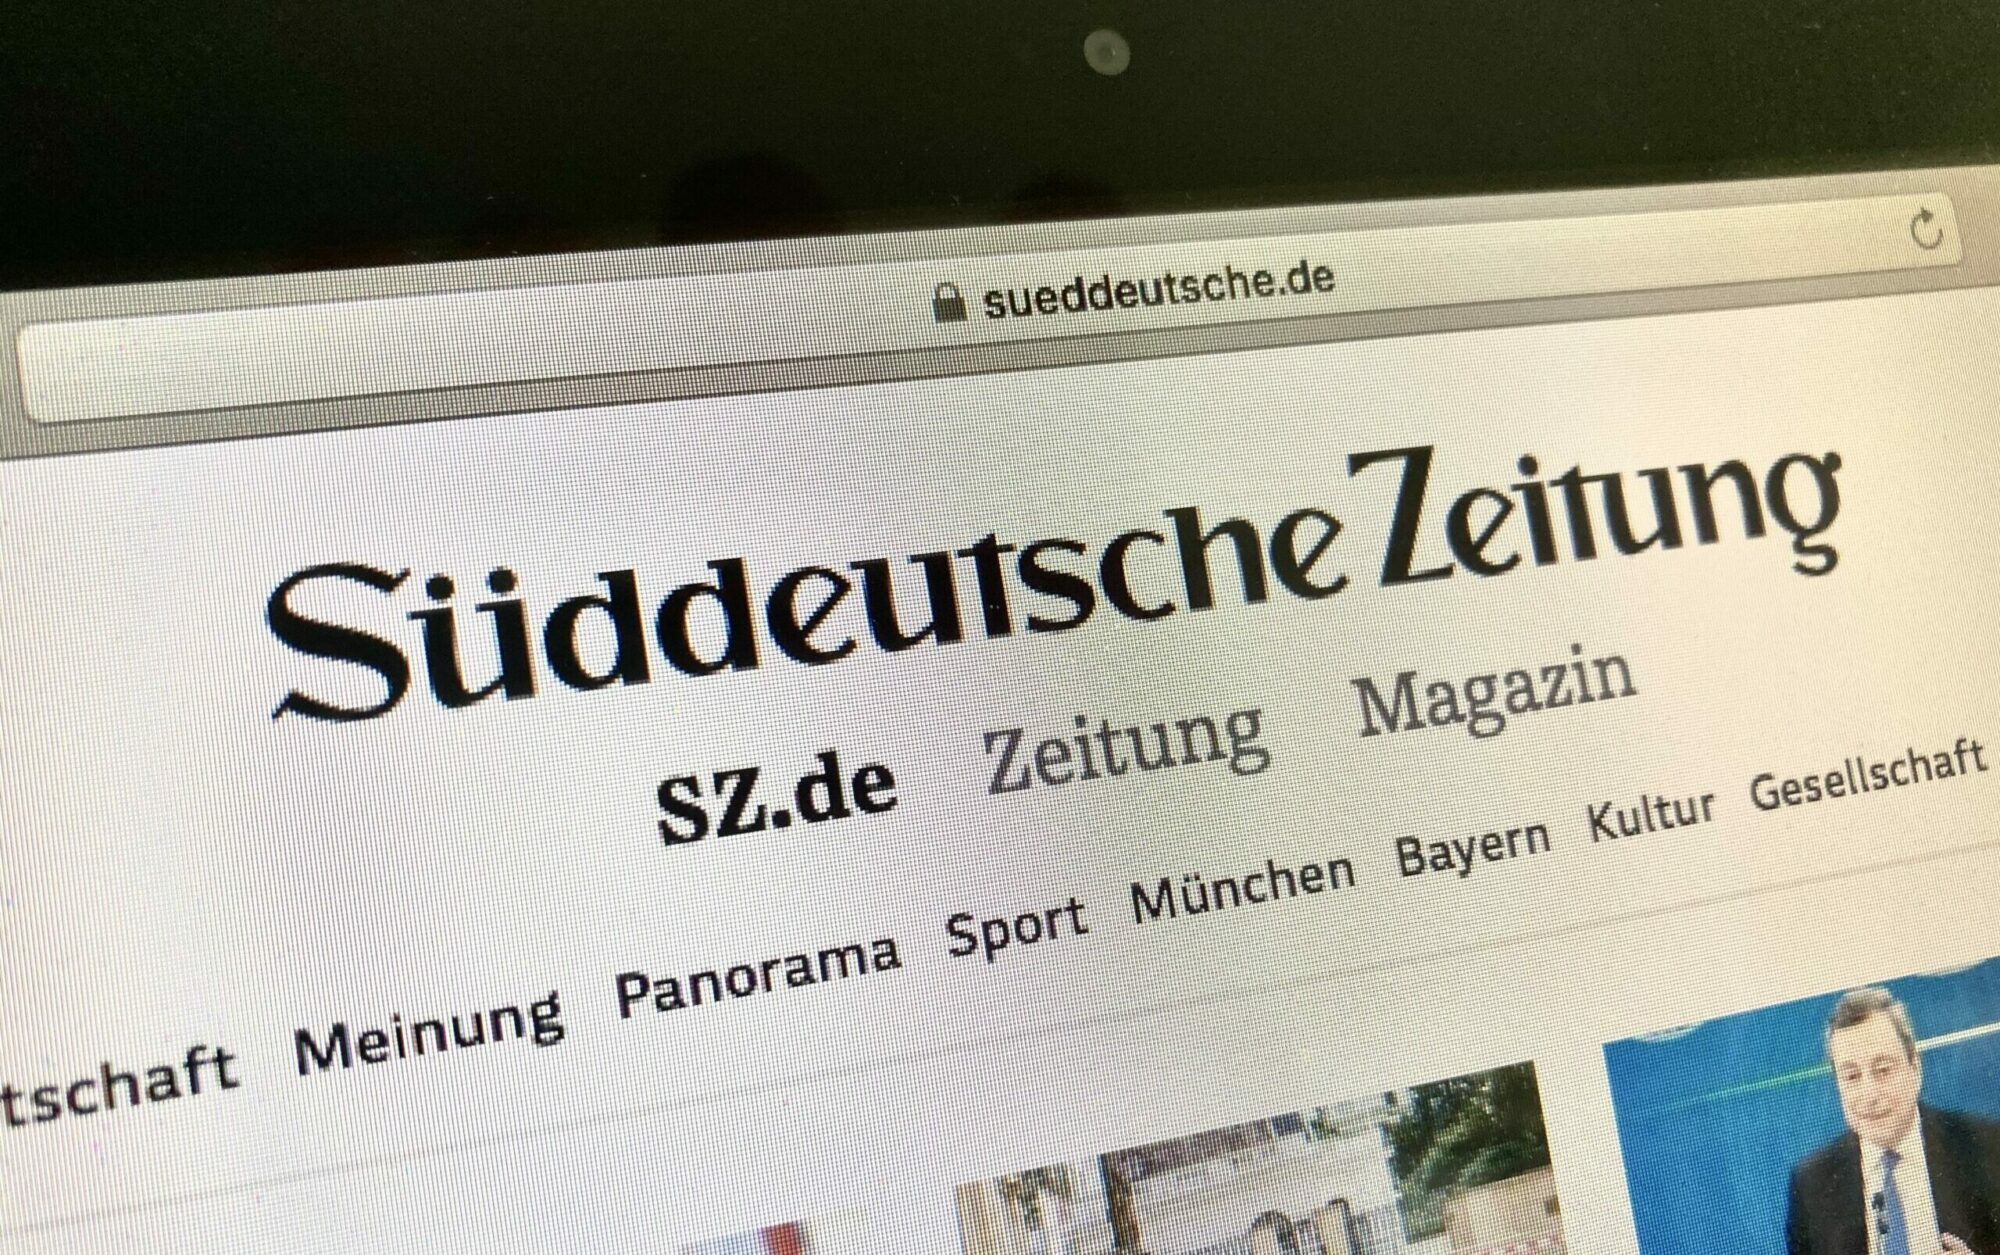 How science journalism accelerated Süddeutsche Zeitung's digital subscriptions